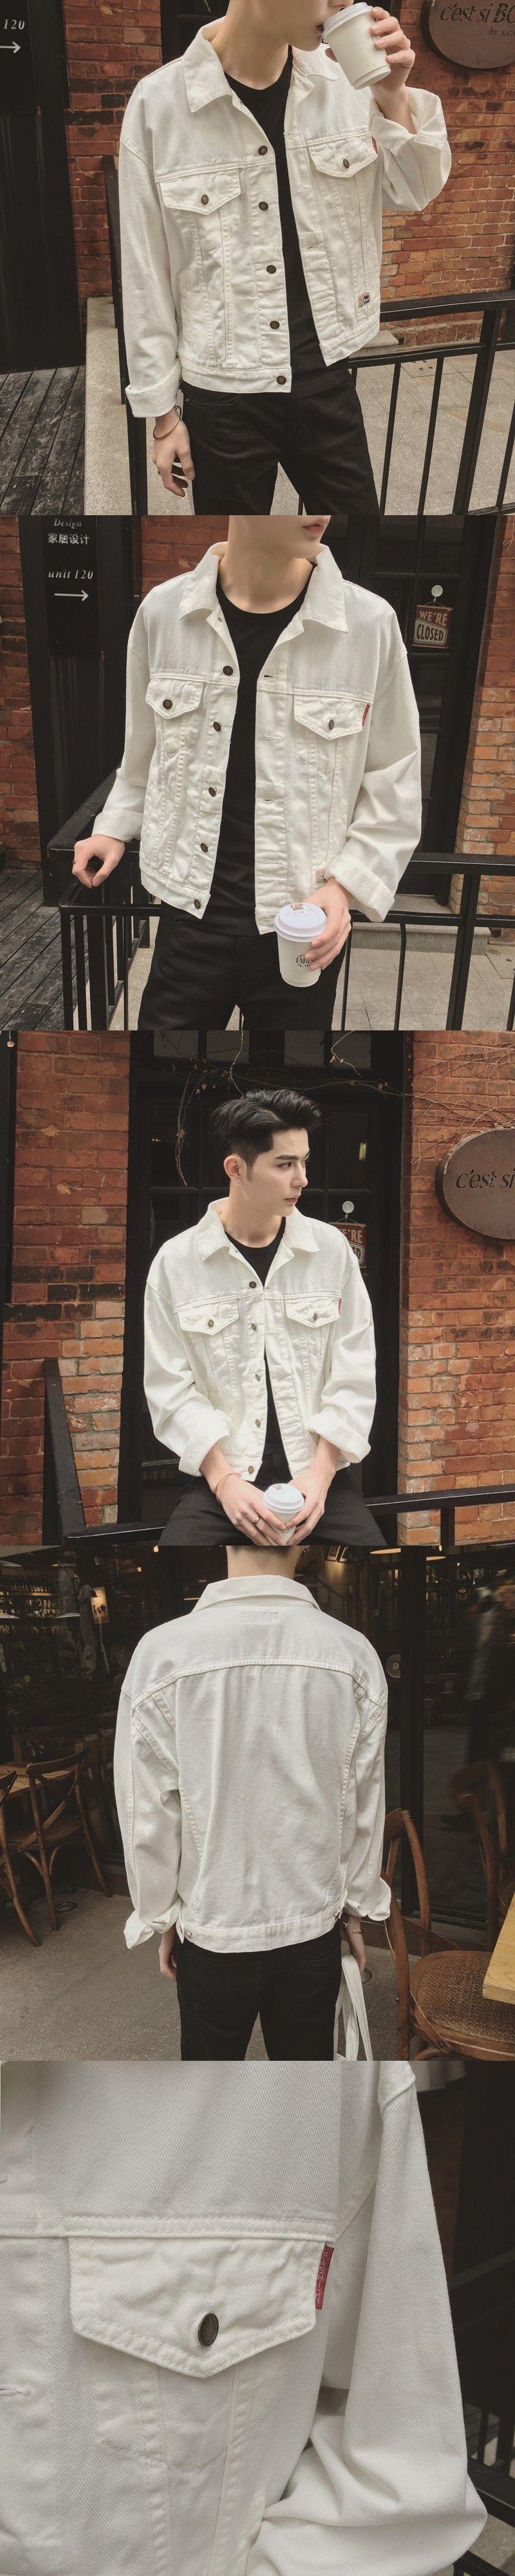 White Denim Jacket Men 2017 New Korean Fashion Mens White Jean Jackets With Flap Pockets At Chest Male White Deni White Jeans Men White Denim Jacket Denim Coat [ 4000 x 800 Pixel ]